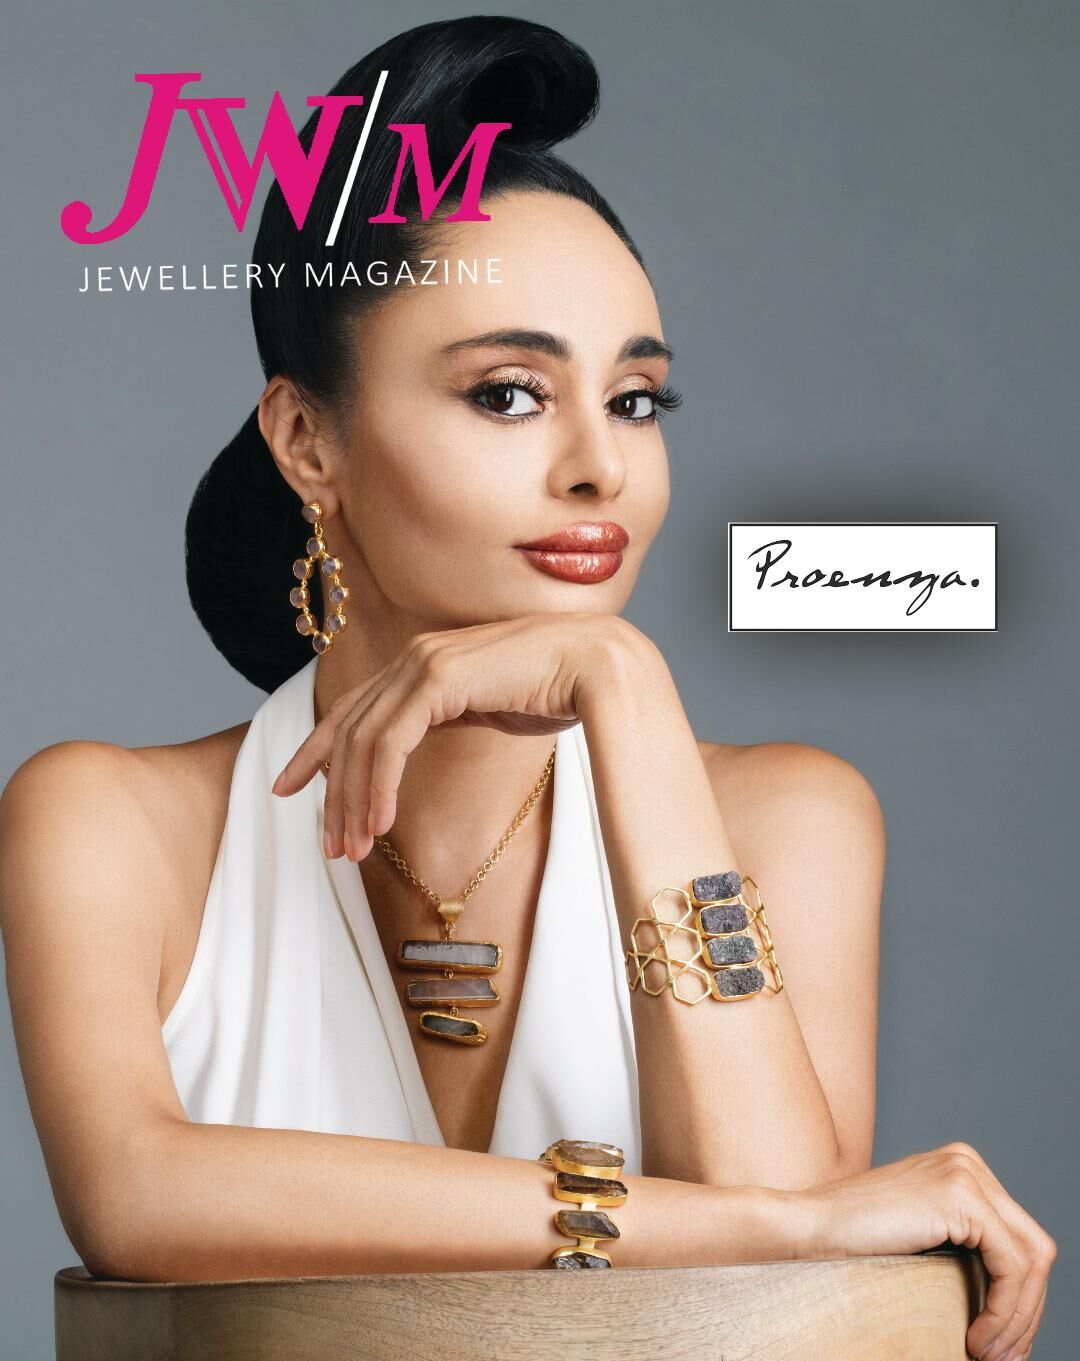 'JW/M Jewellery Magazine' Cover